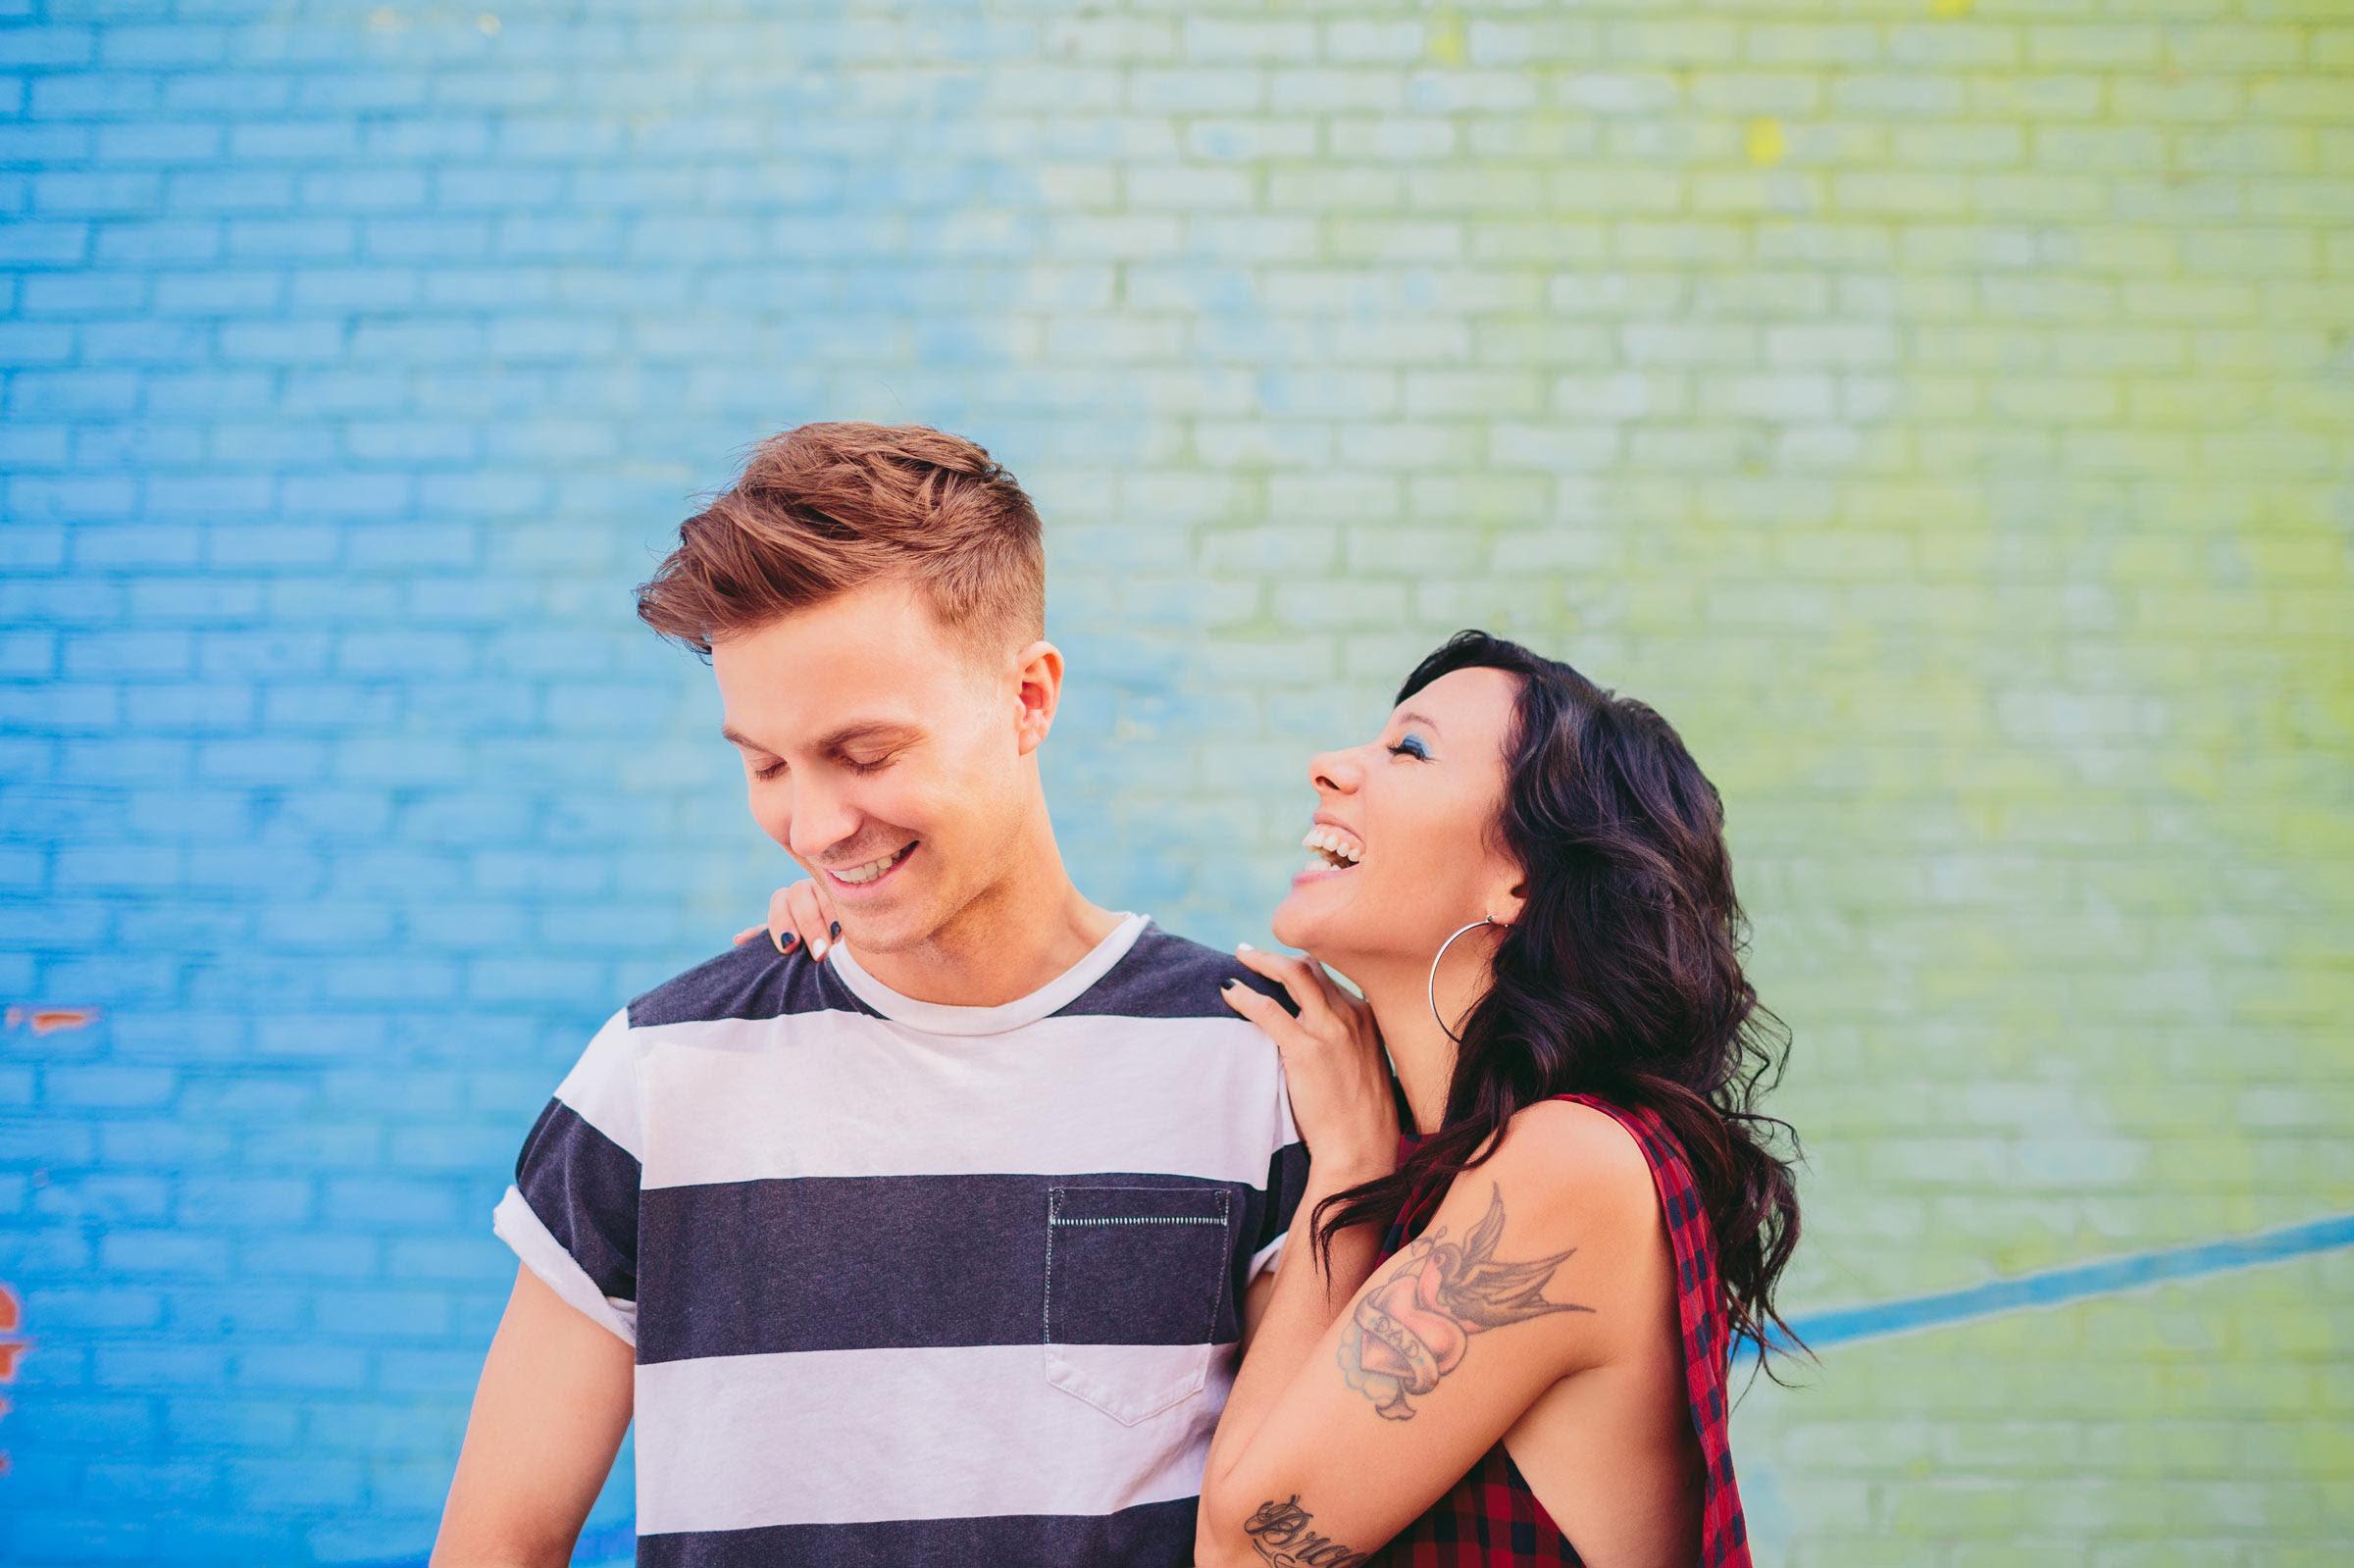 Today, Matt & Kim announced the release of a 4-song EP